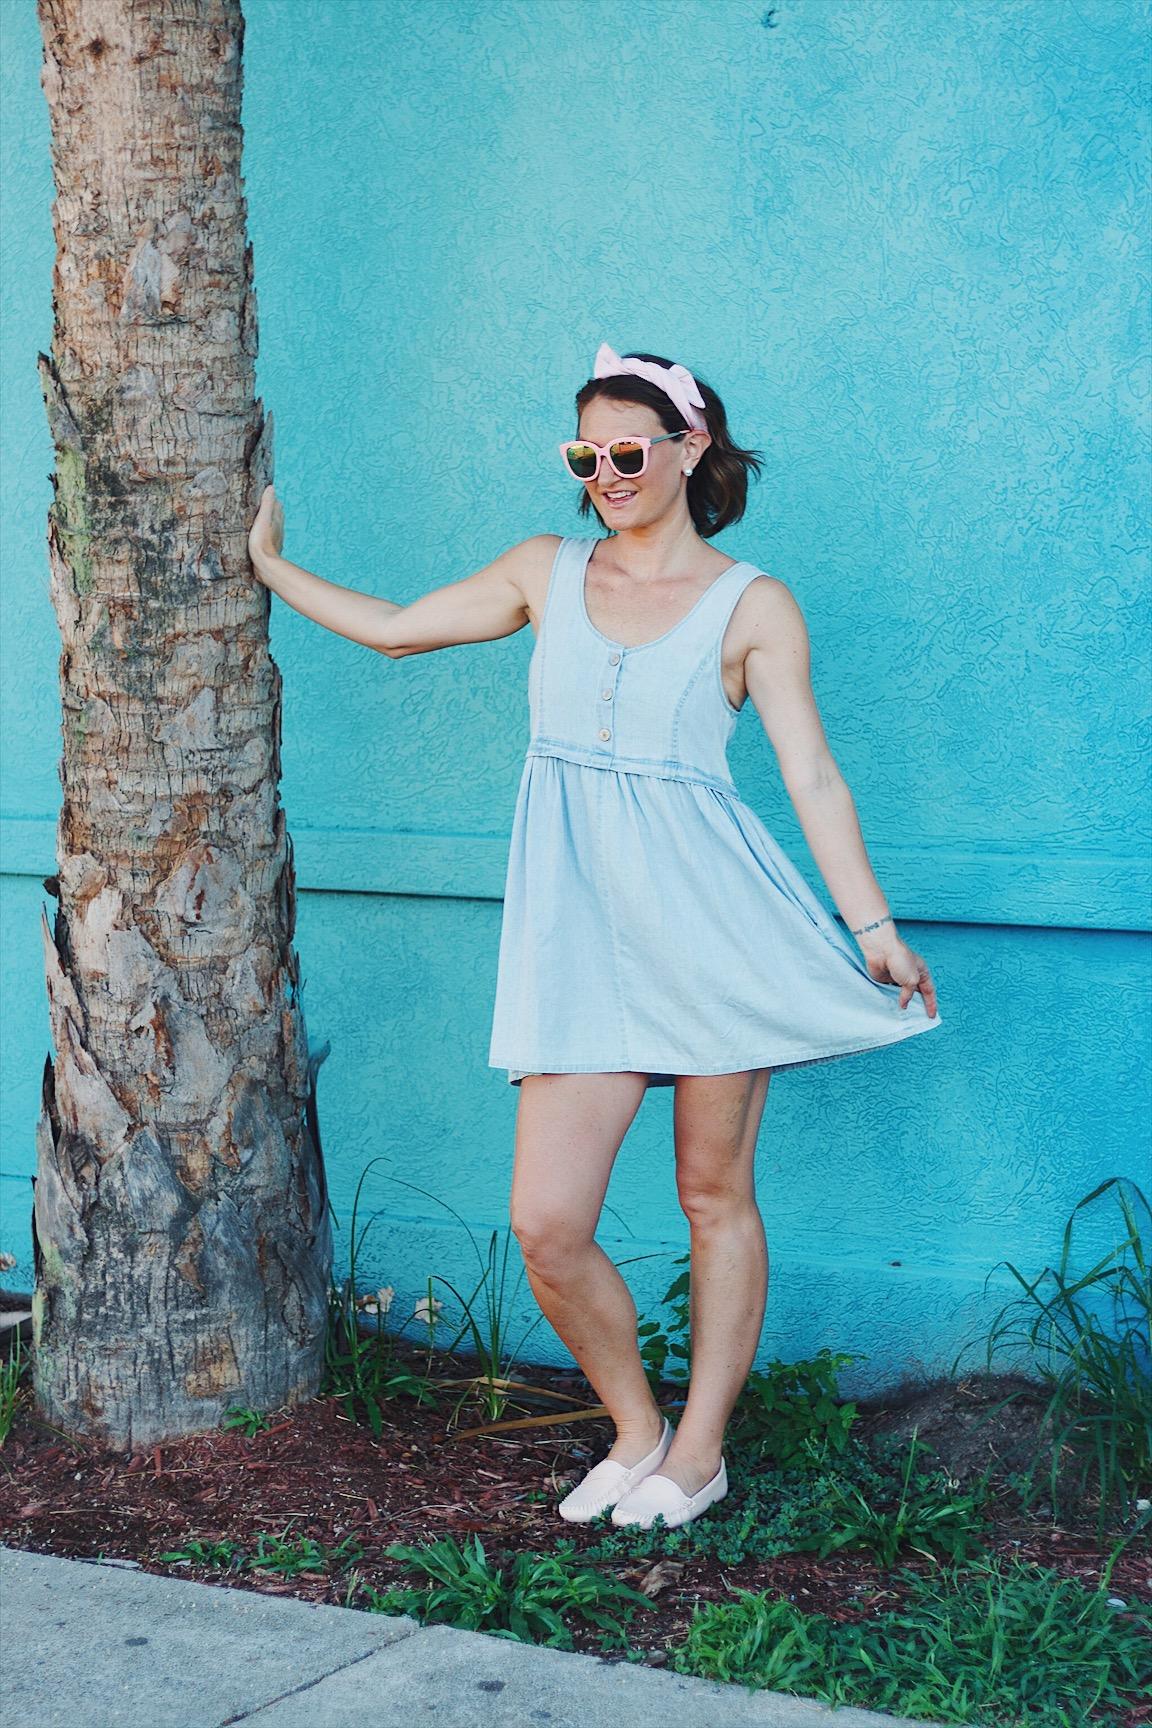 denim dress, pink sunglasses, pink hair wrap, pink moccasins